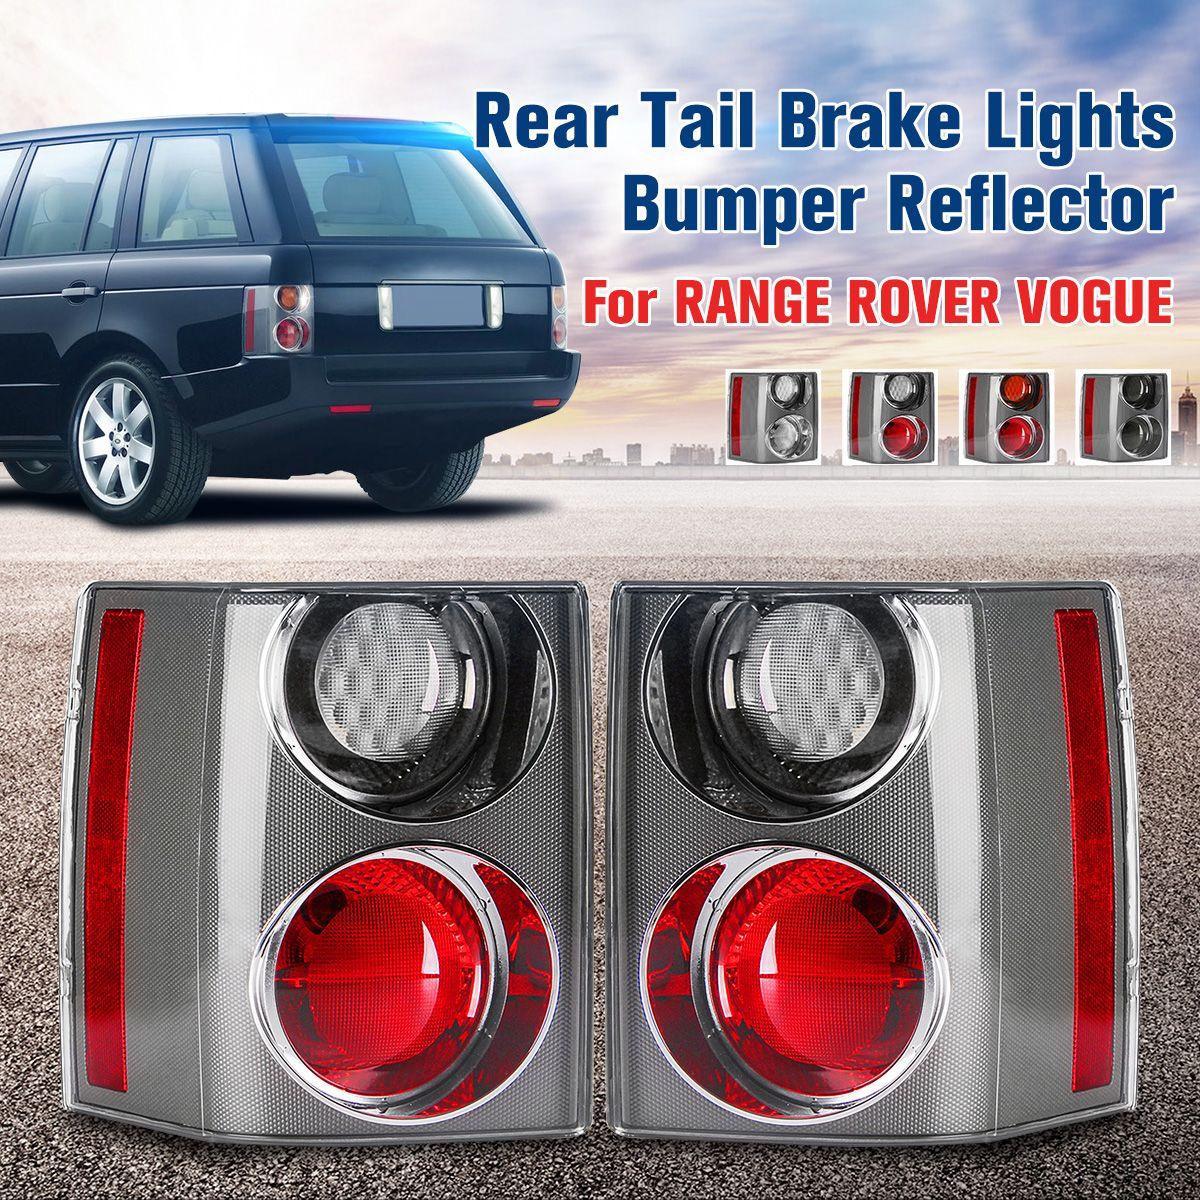 1 Pair Rear Tail Brake Lights Bumper Reflector Tail Brake Stop Light For RANGE for LAND ROVER VOGUE L322 2002 2003 2004 05-2009